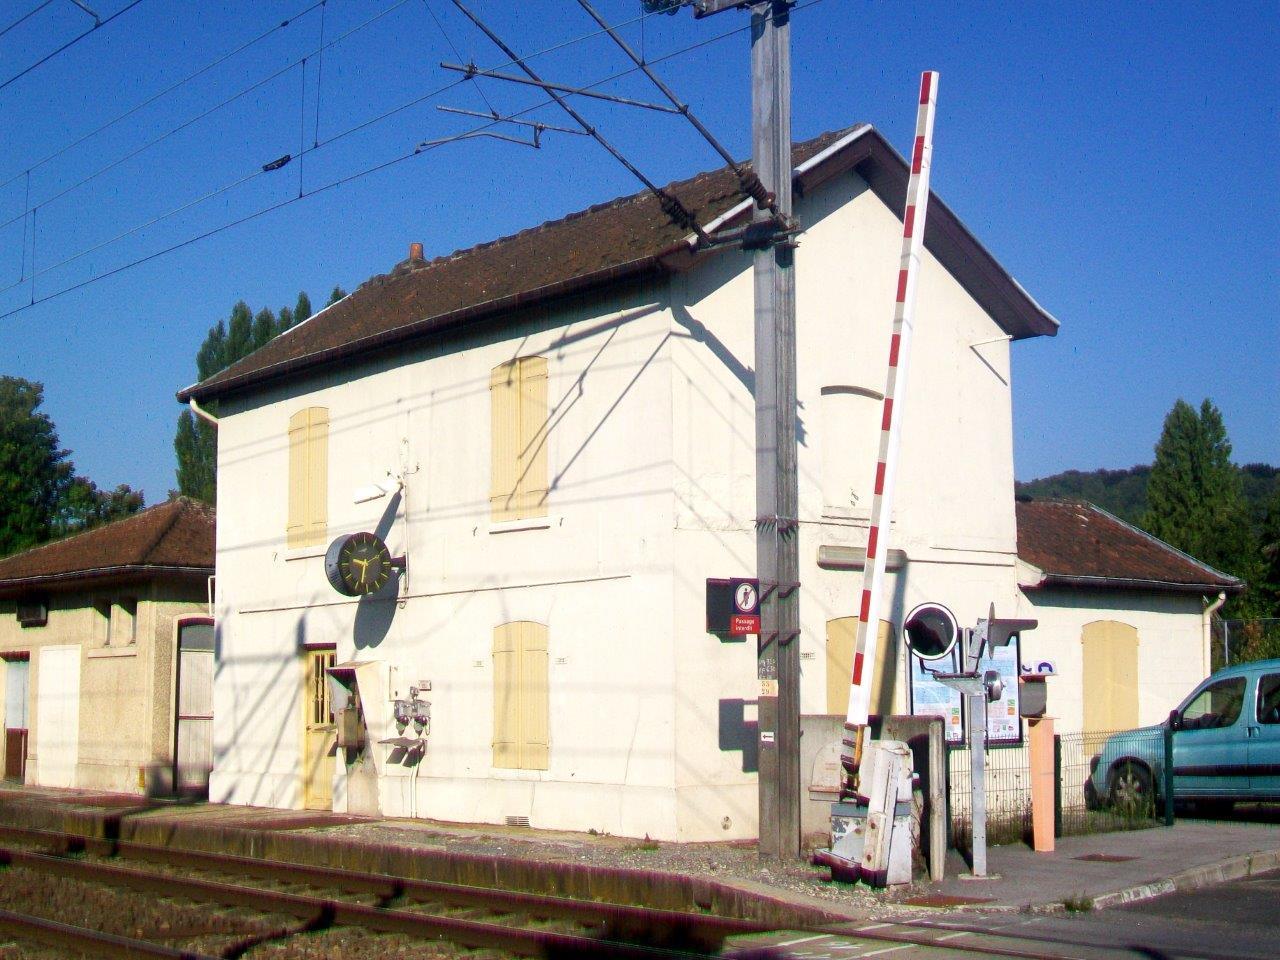 gare-de-rieux-angicourt-train-station